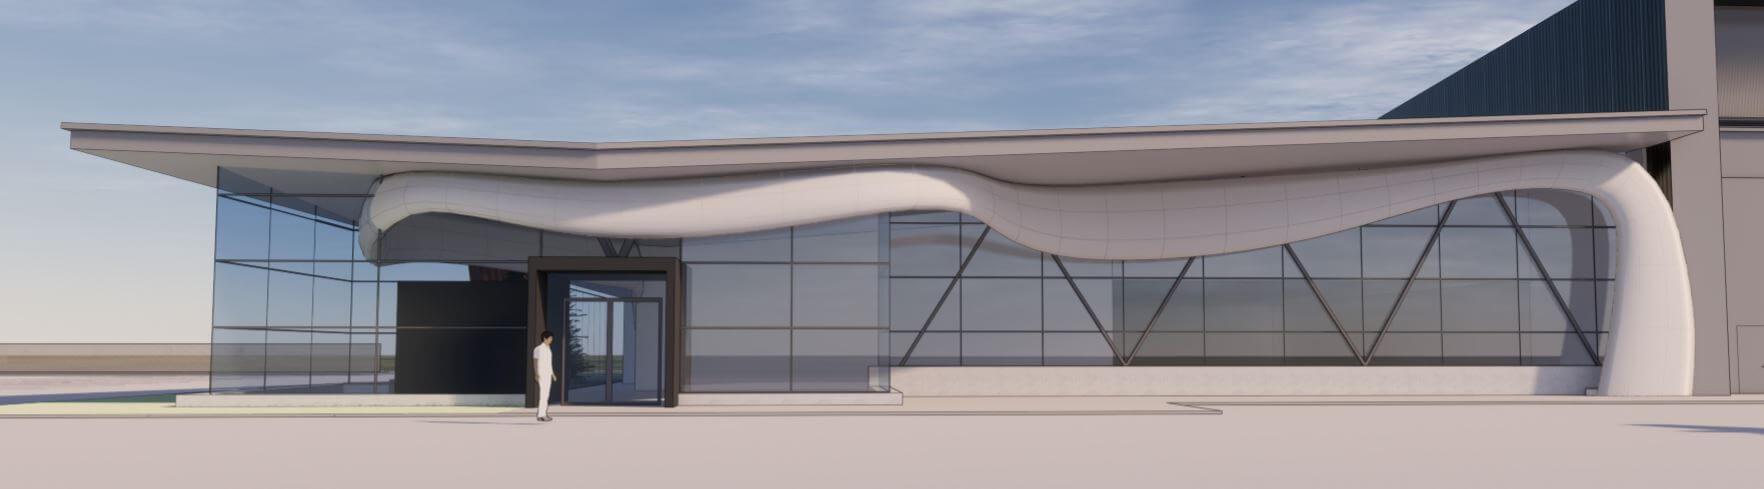 hangar-elevation